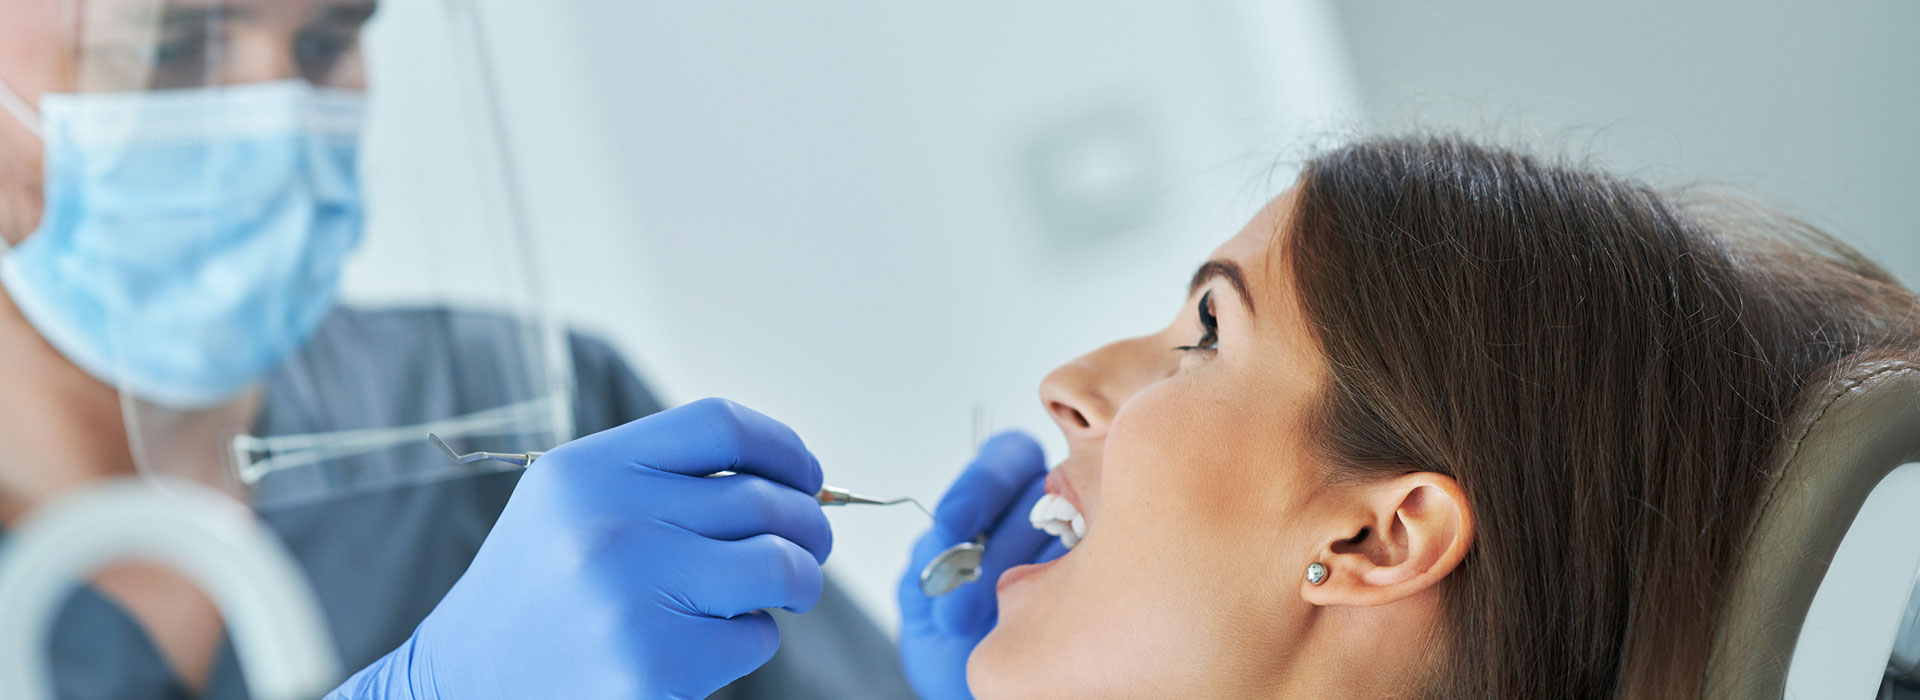 Woman is having a dental surgery